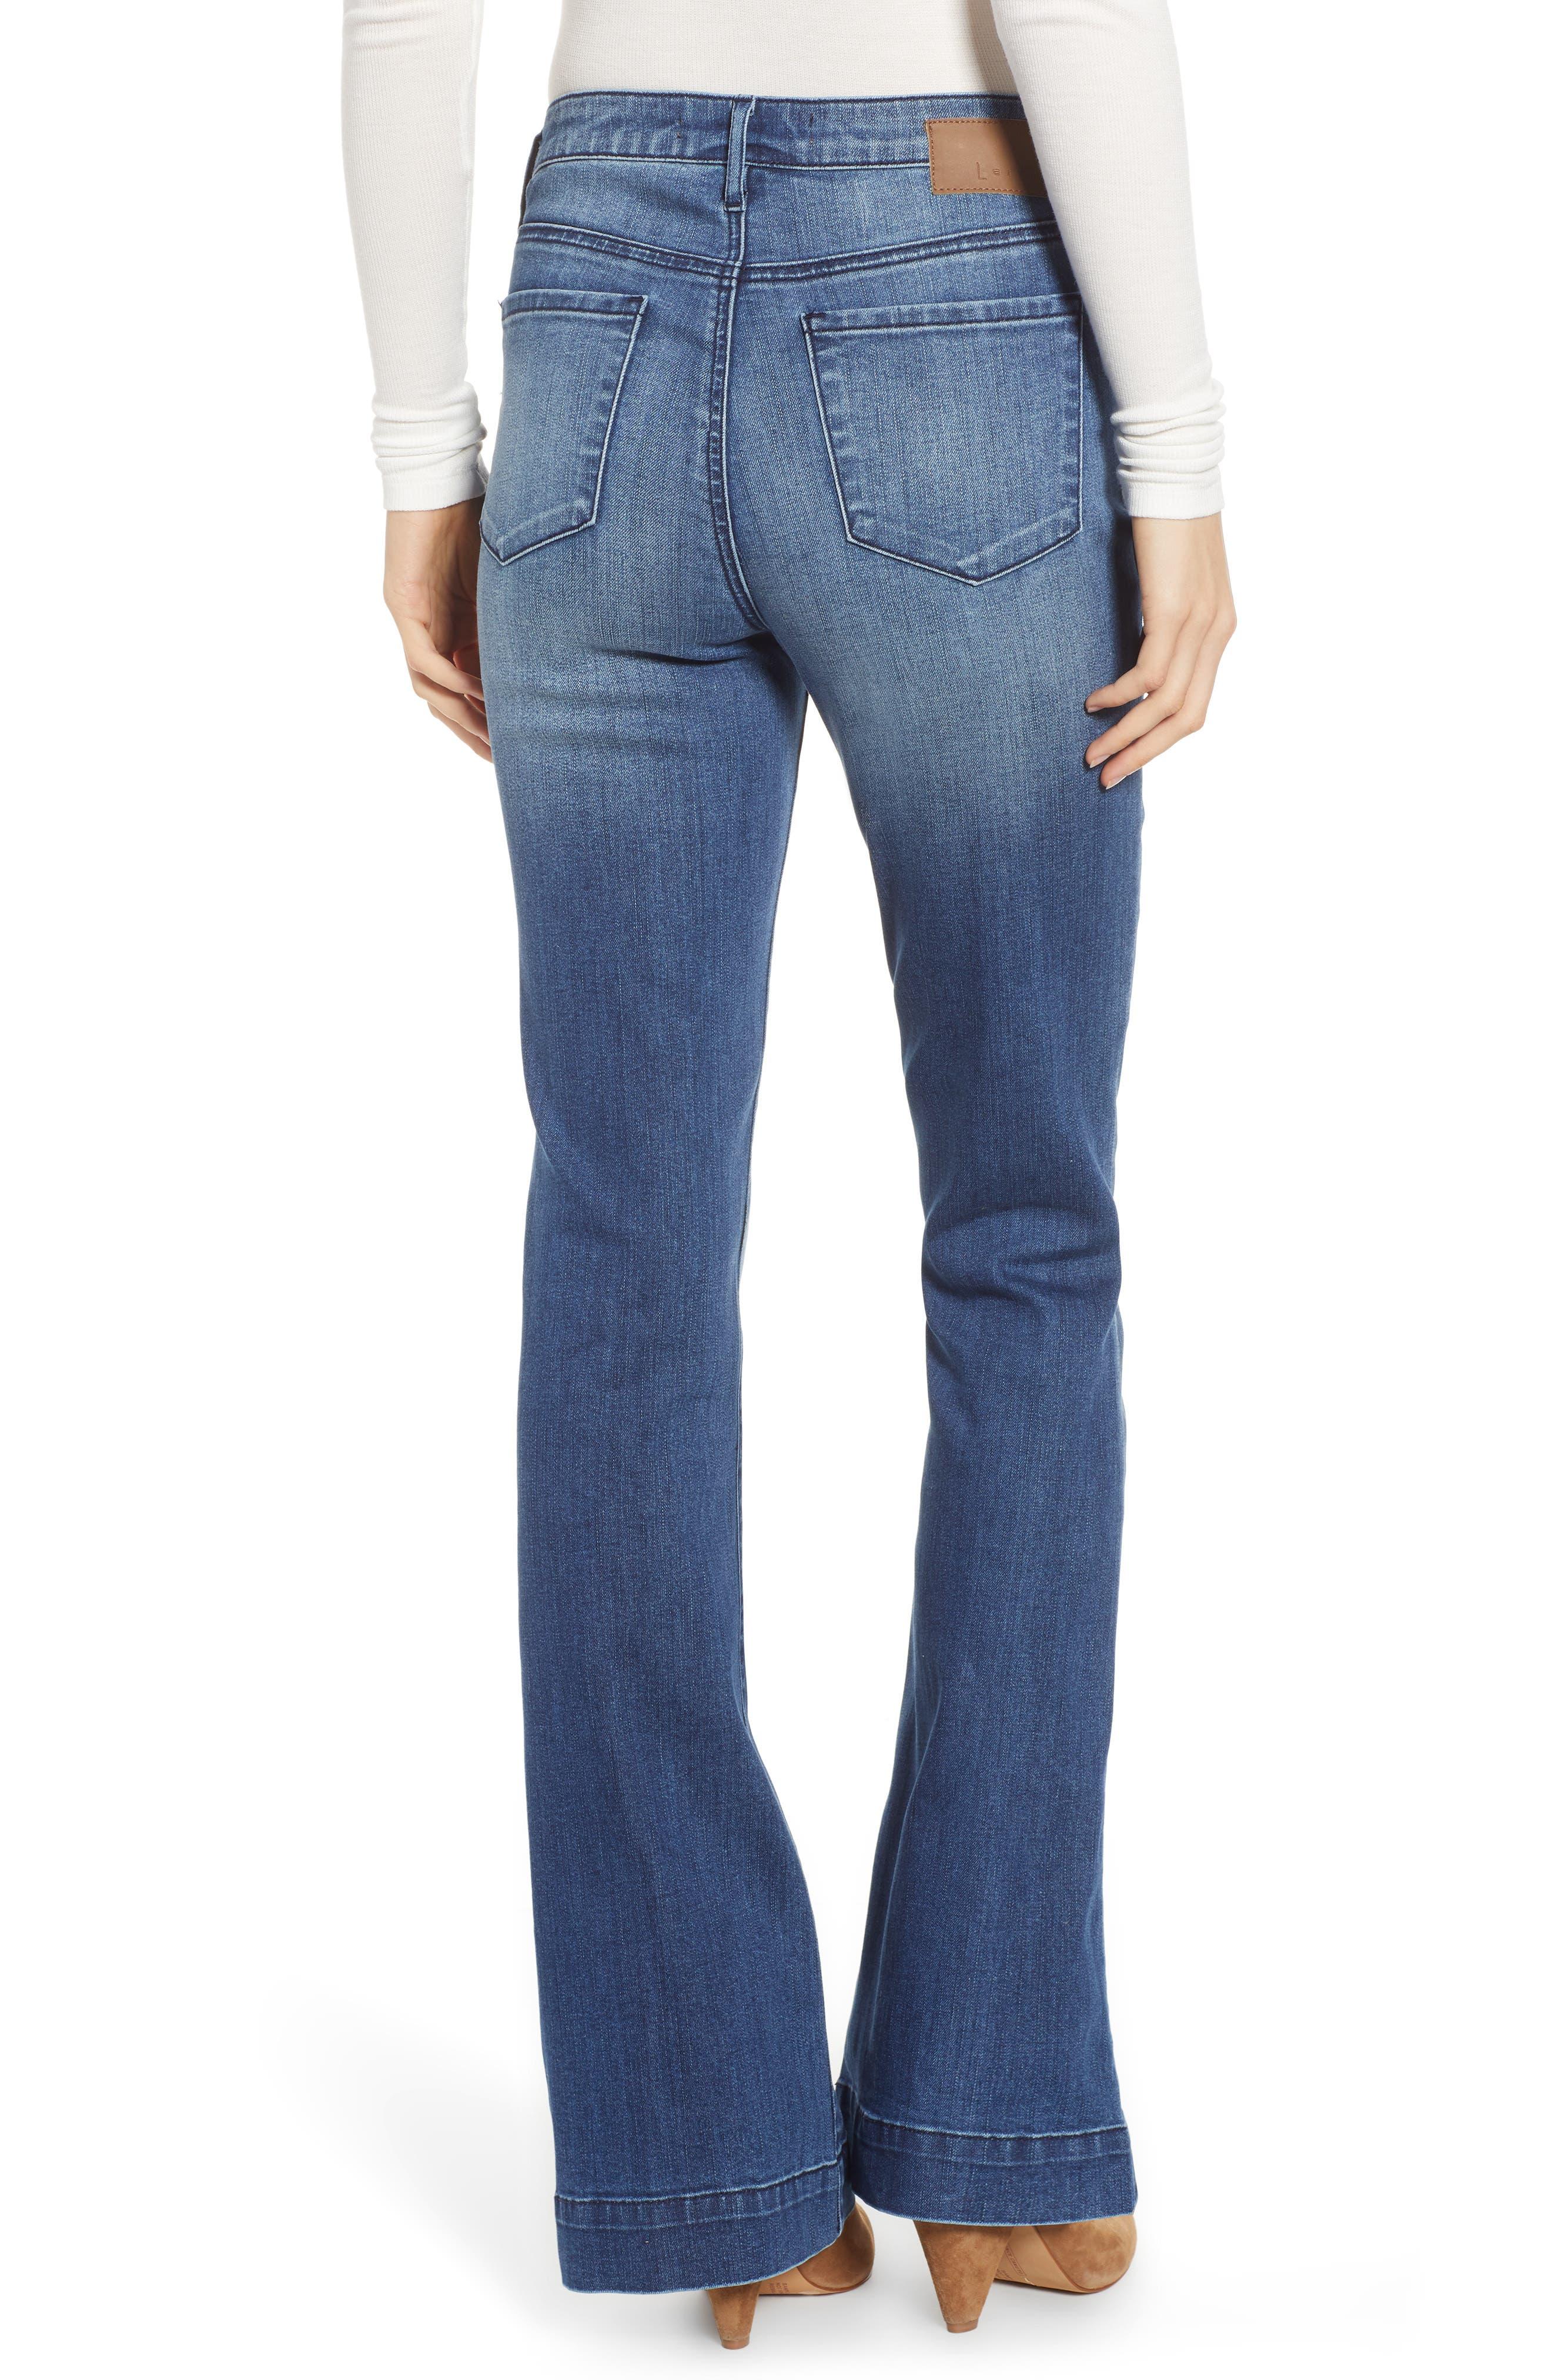 LEITH, High Waist Flare Jeans, Alternate thumbnail 2, color, MEDIUM WASH